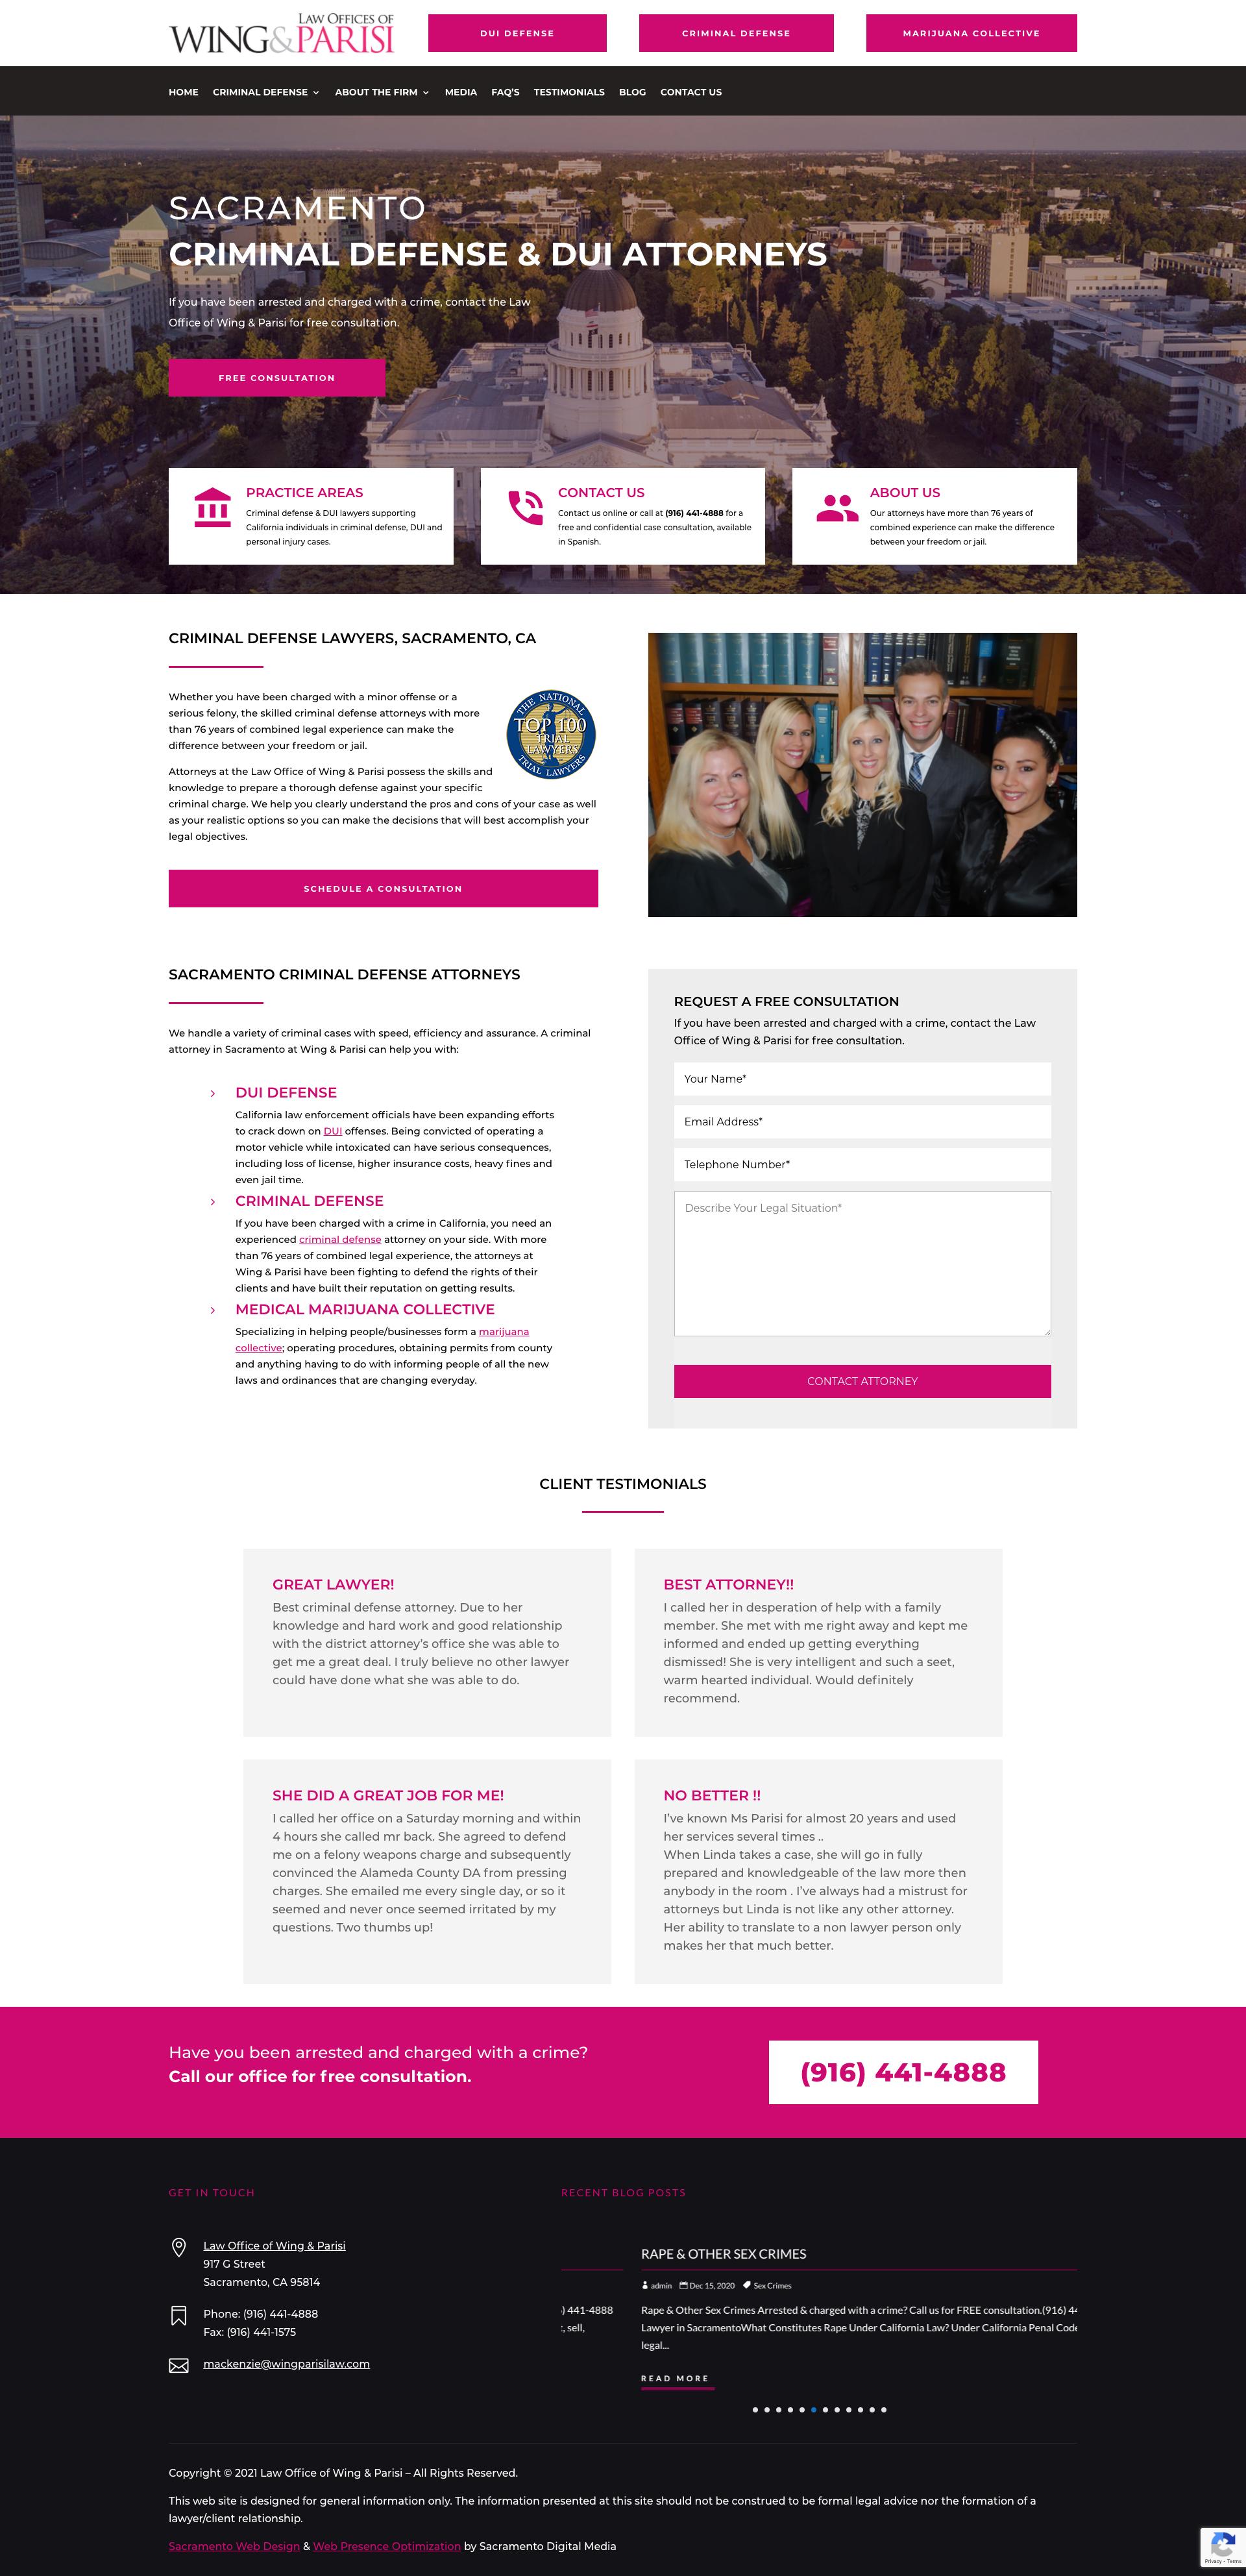 Website Design in Sacramento - Wing Parisi Law